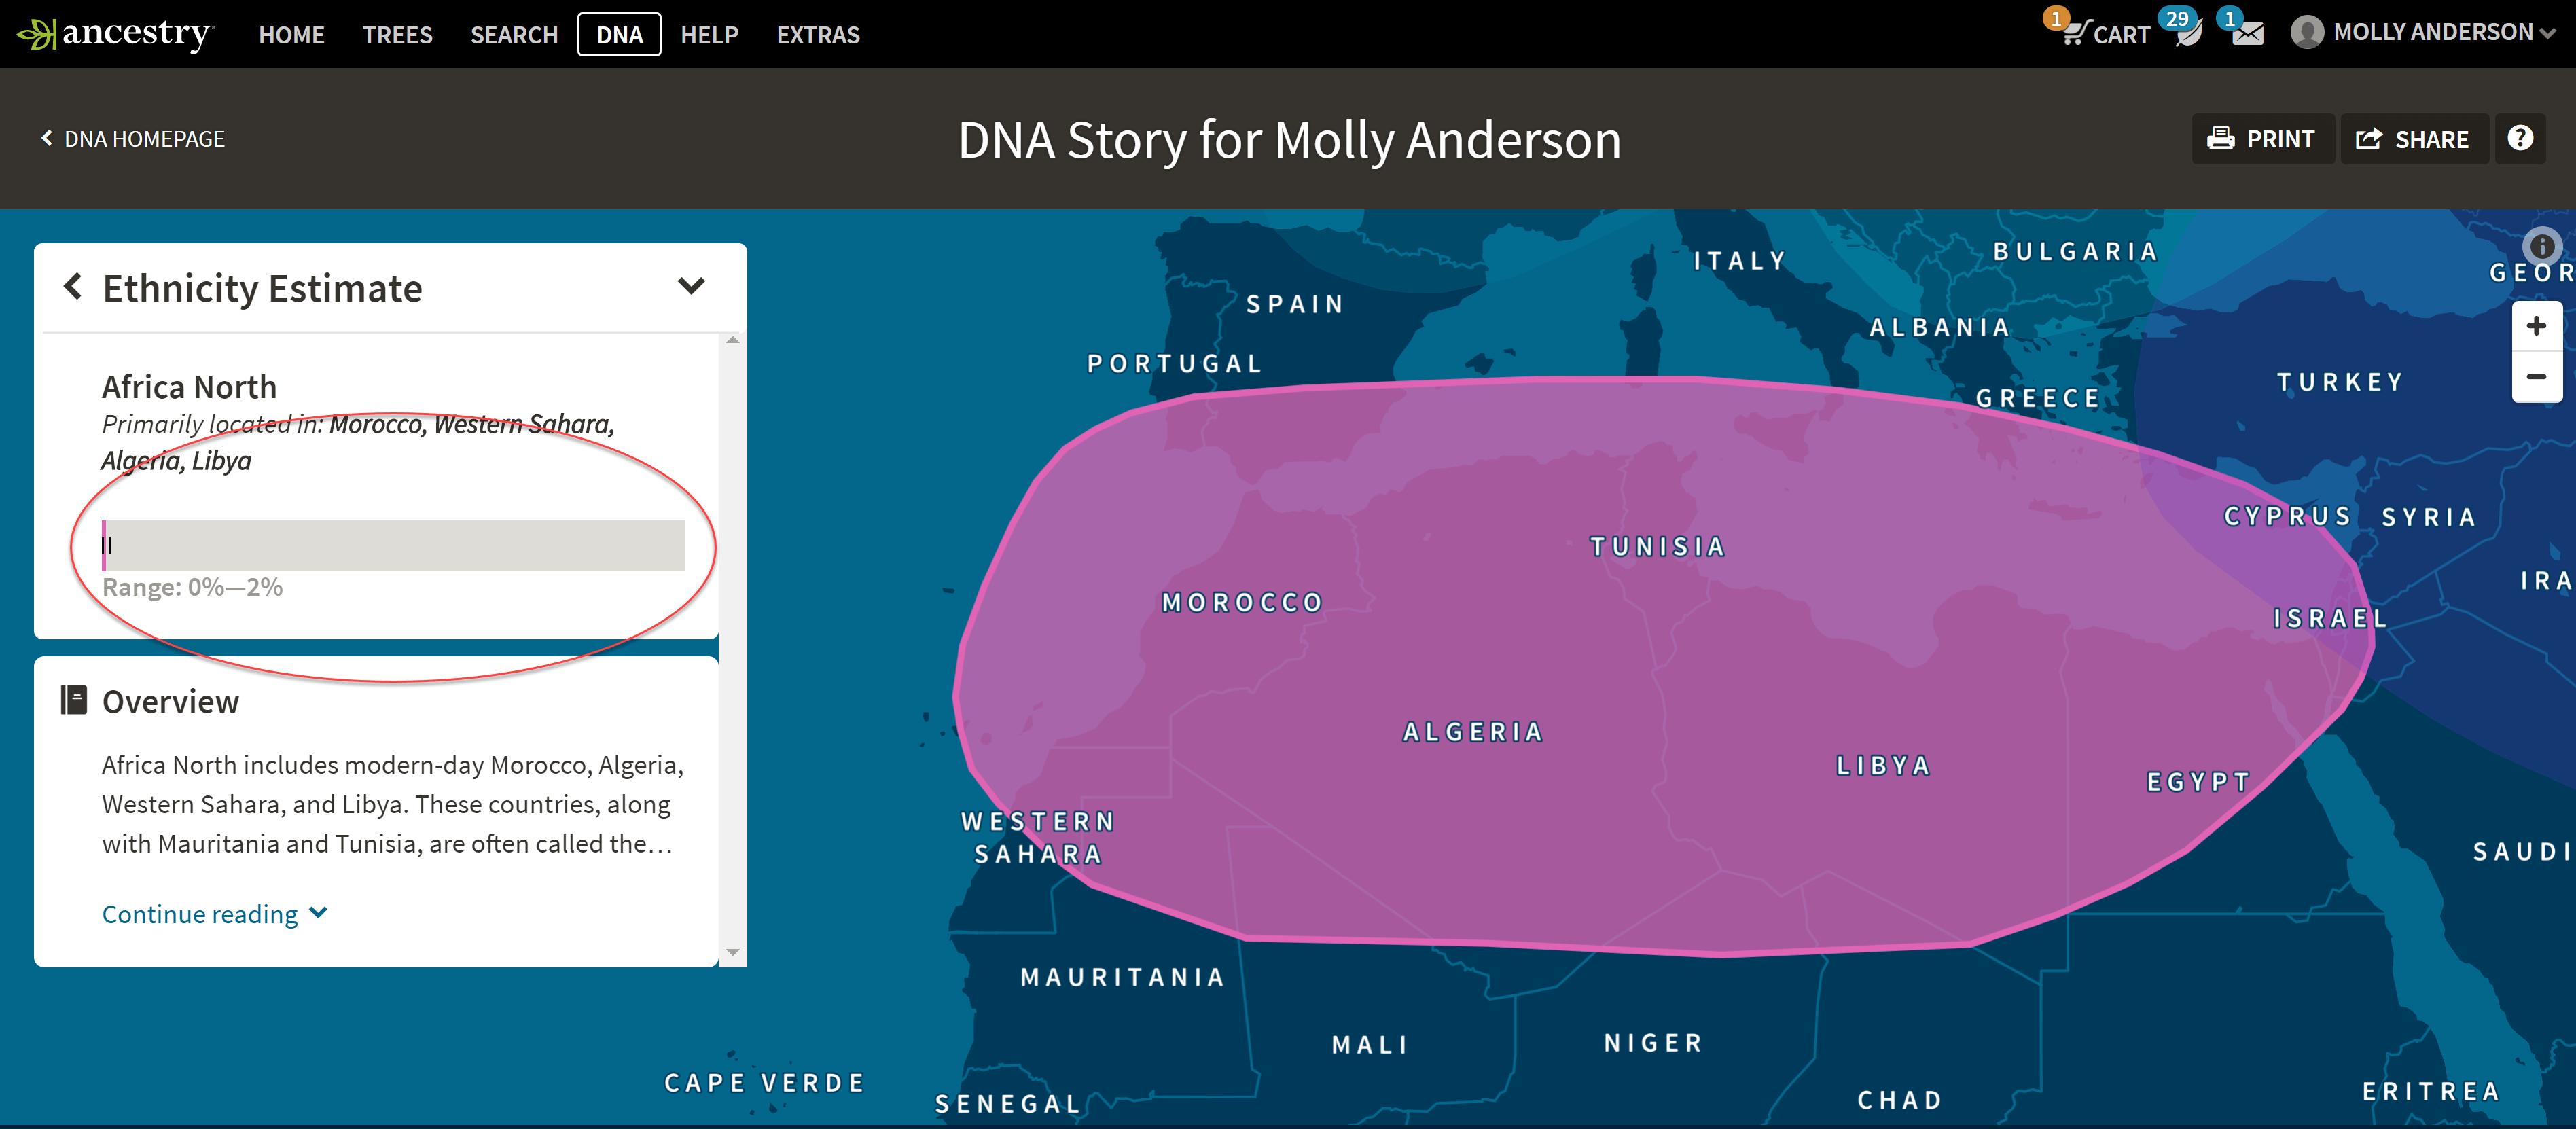 AncestryDNA Ethnicity